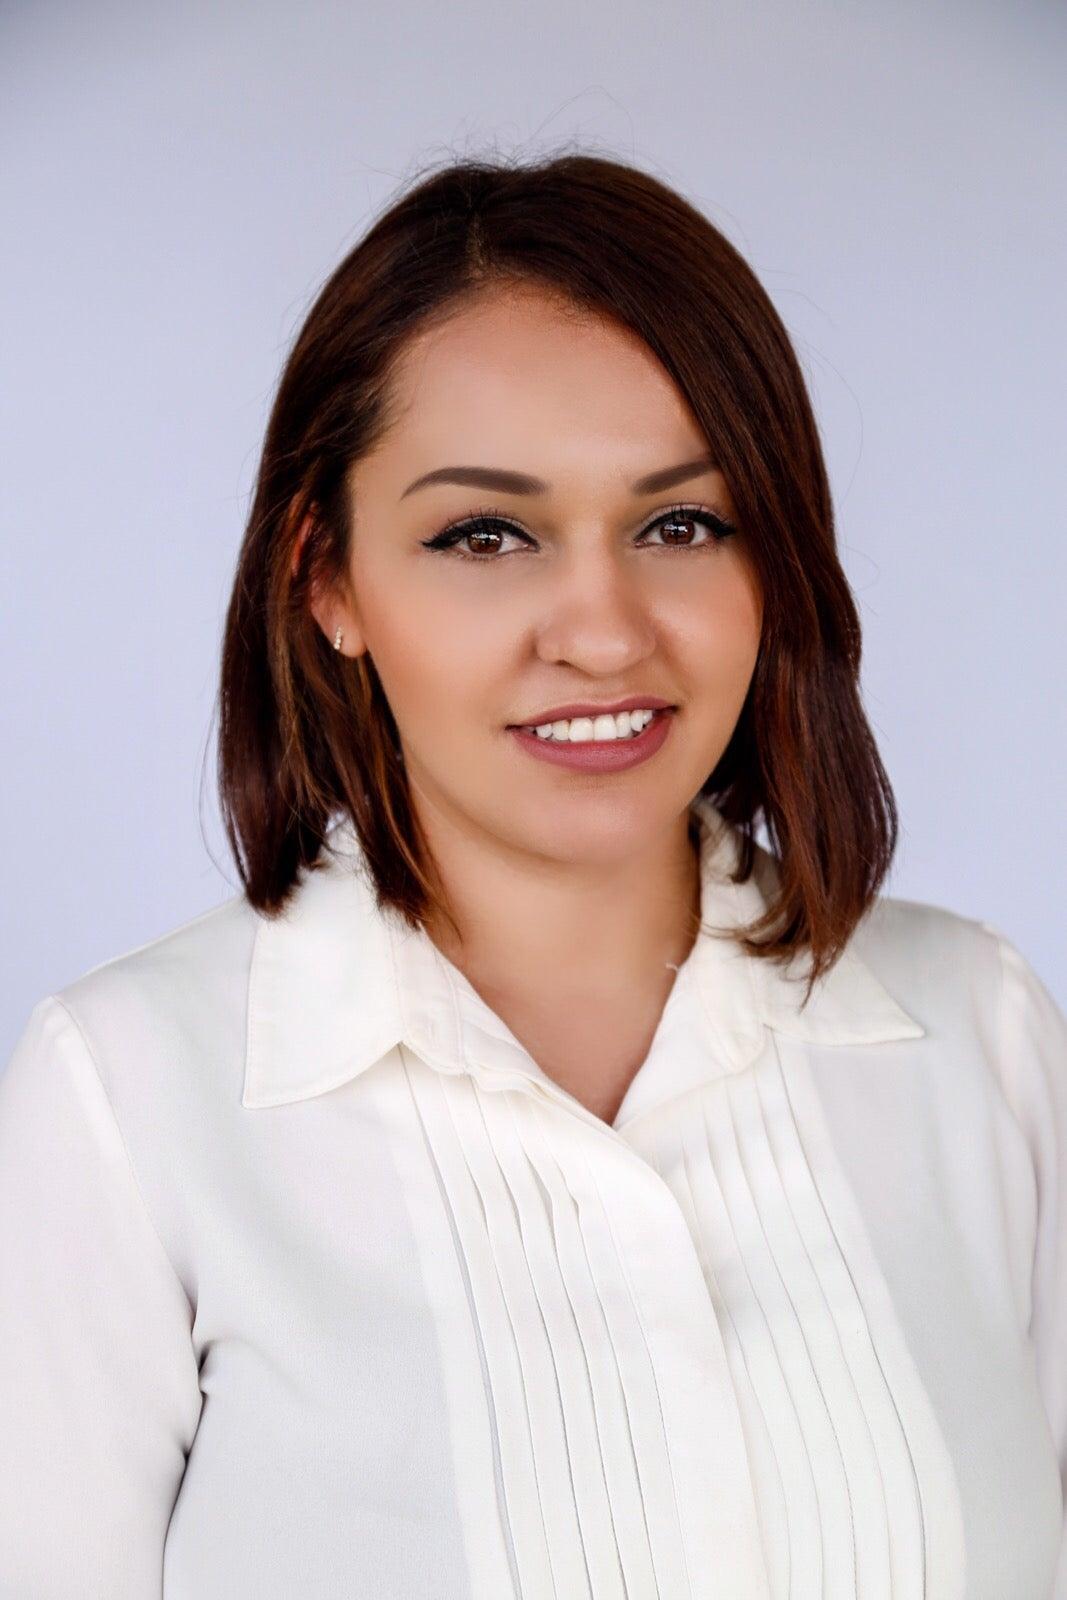 Yareli Aguirre-Barthell, PA-C